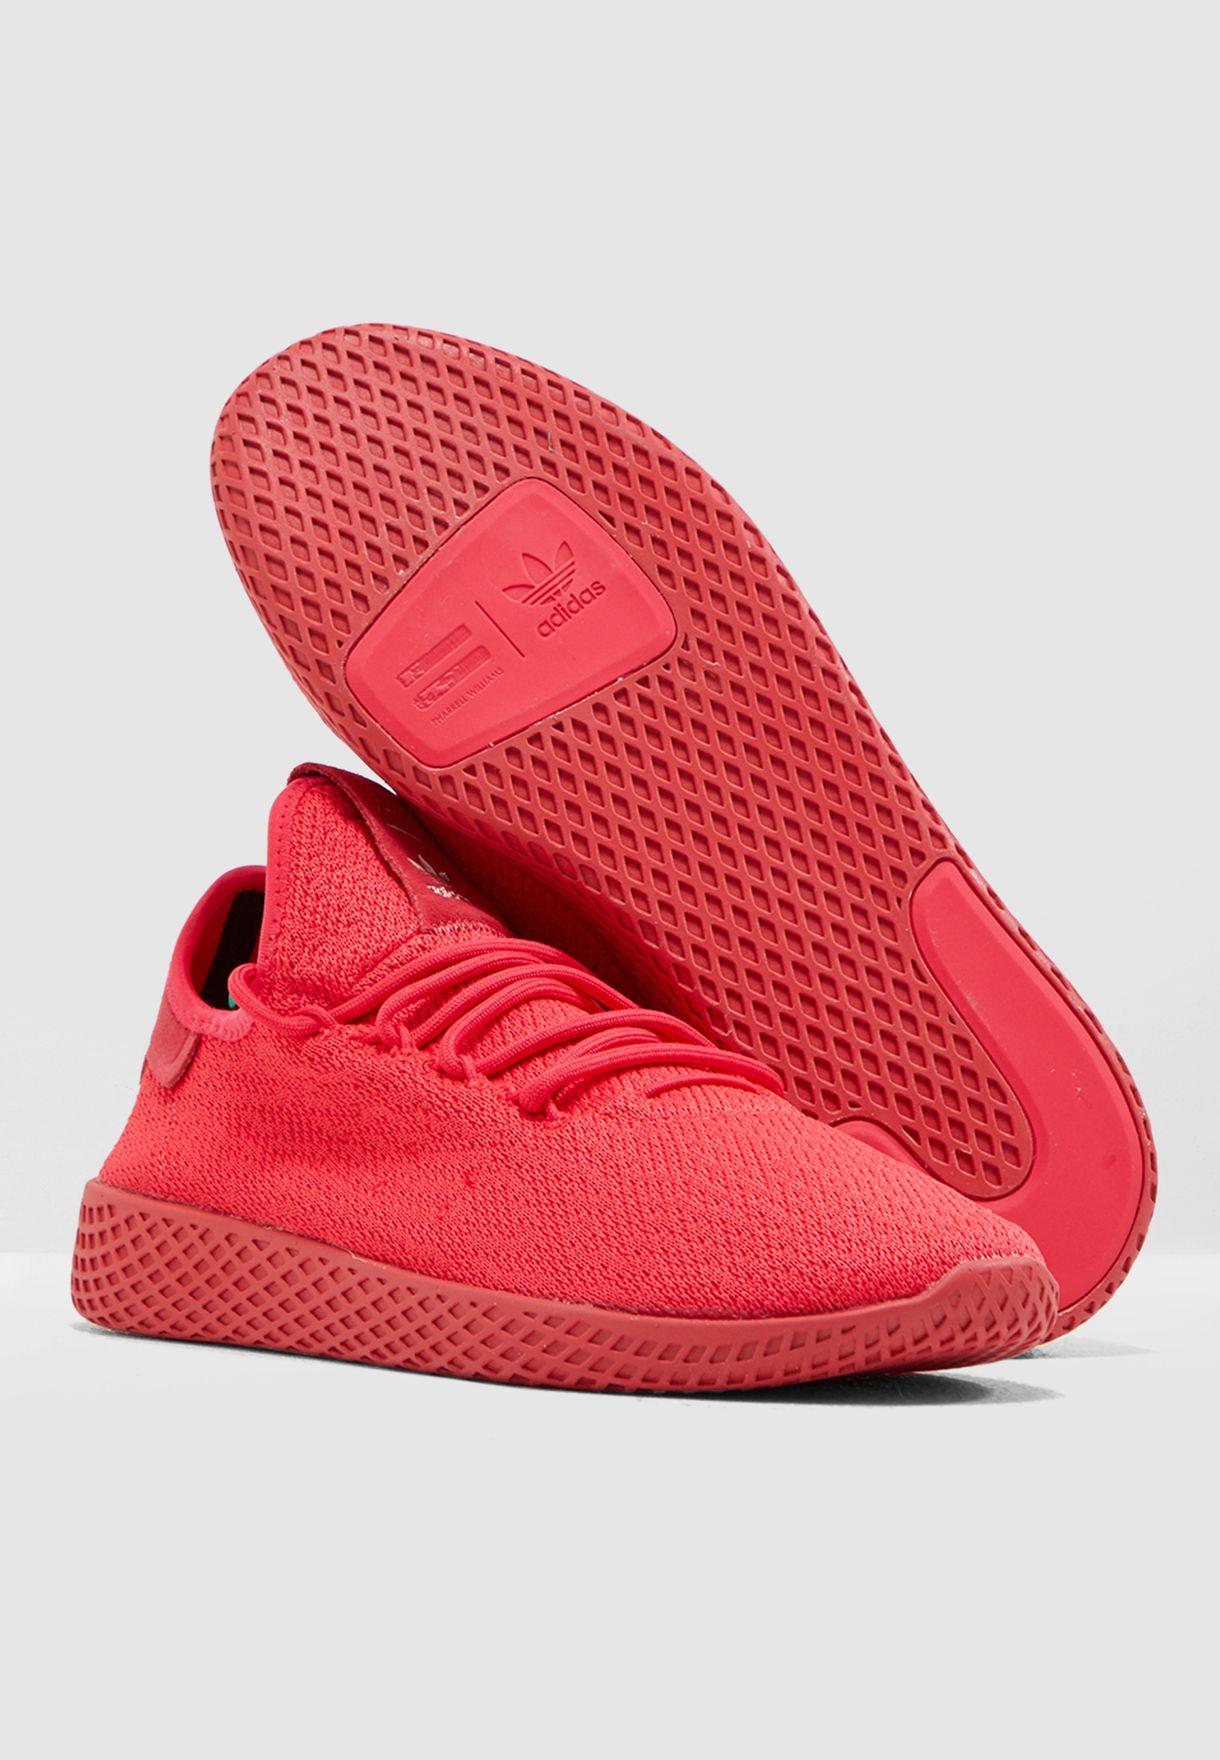 f7aac84329bae Shop adidas Originals pink Pharrell Williams Tennis HU D96553 for ...